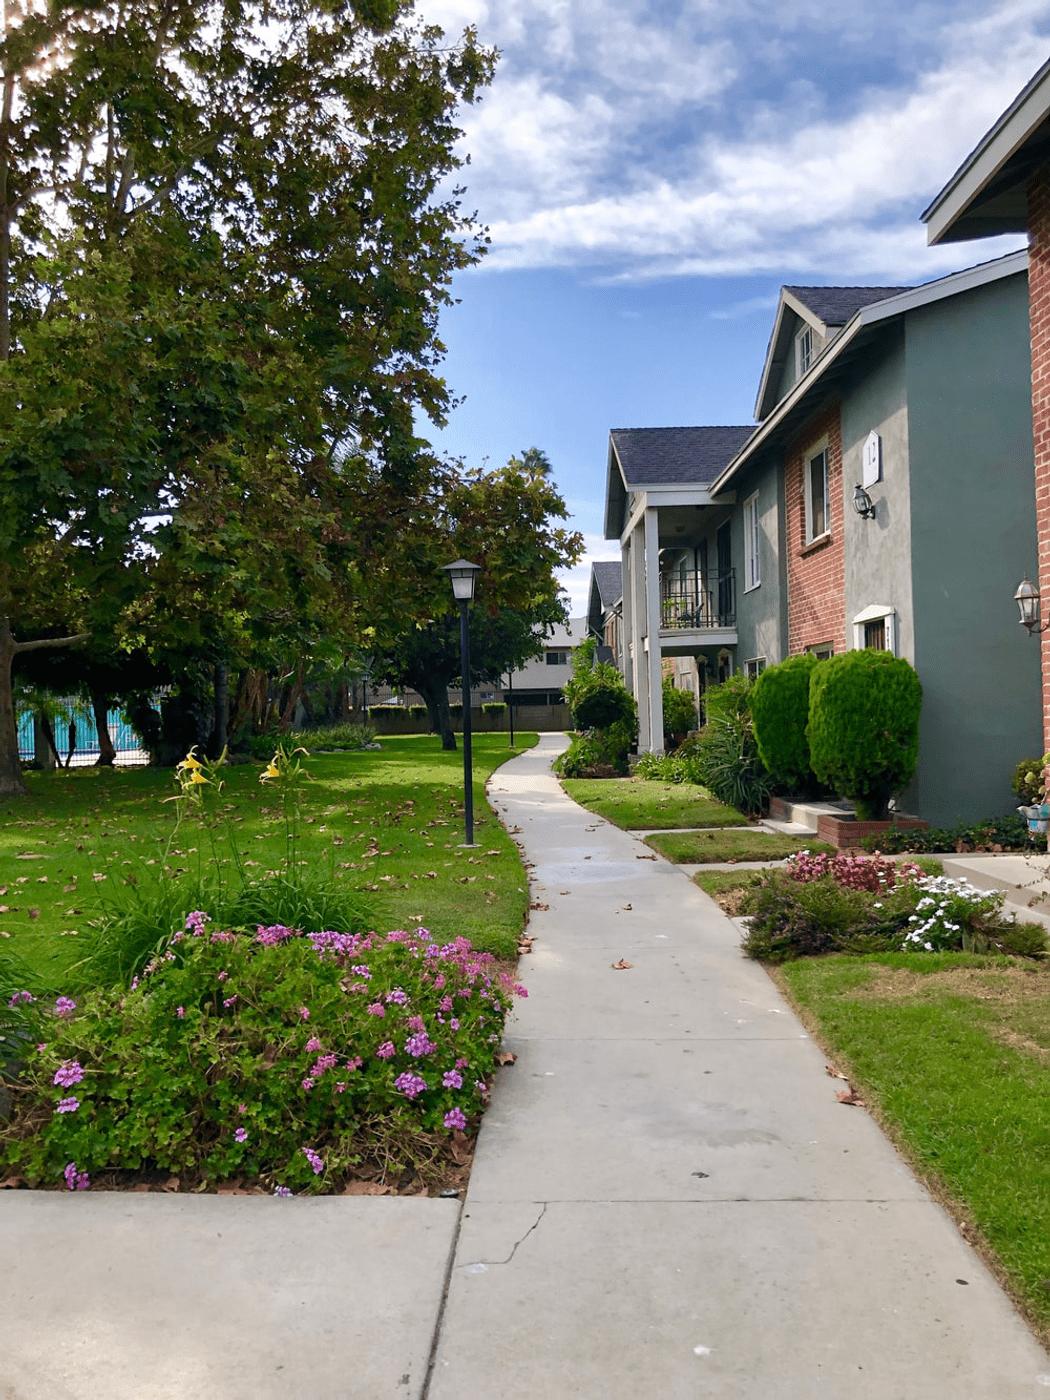 stunning residential neighborhood with fresh green grass and modern properties